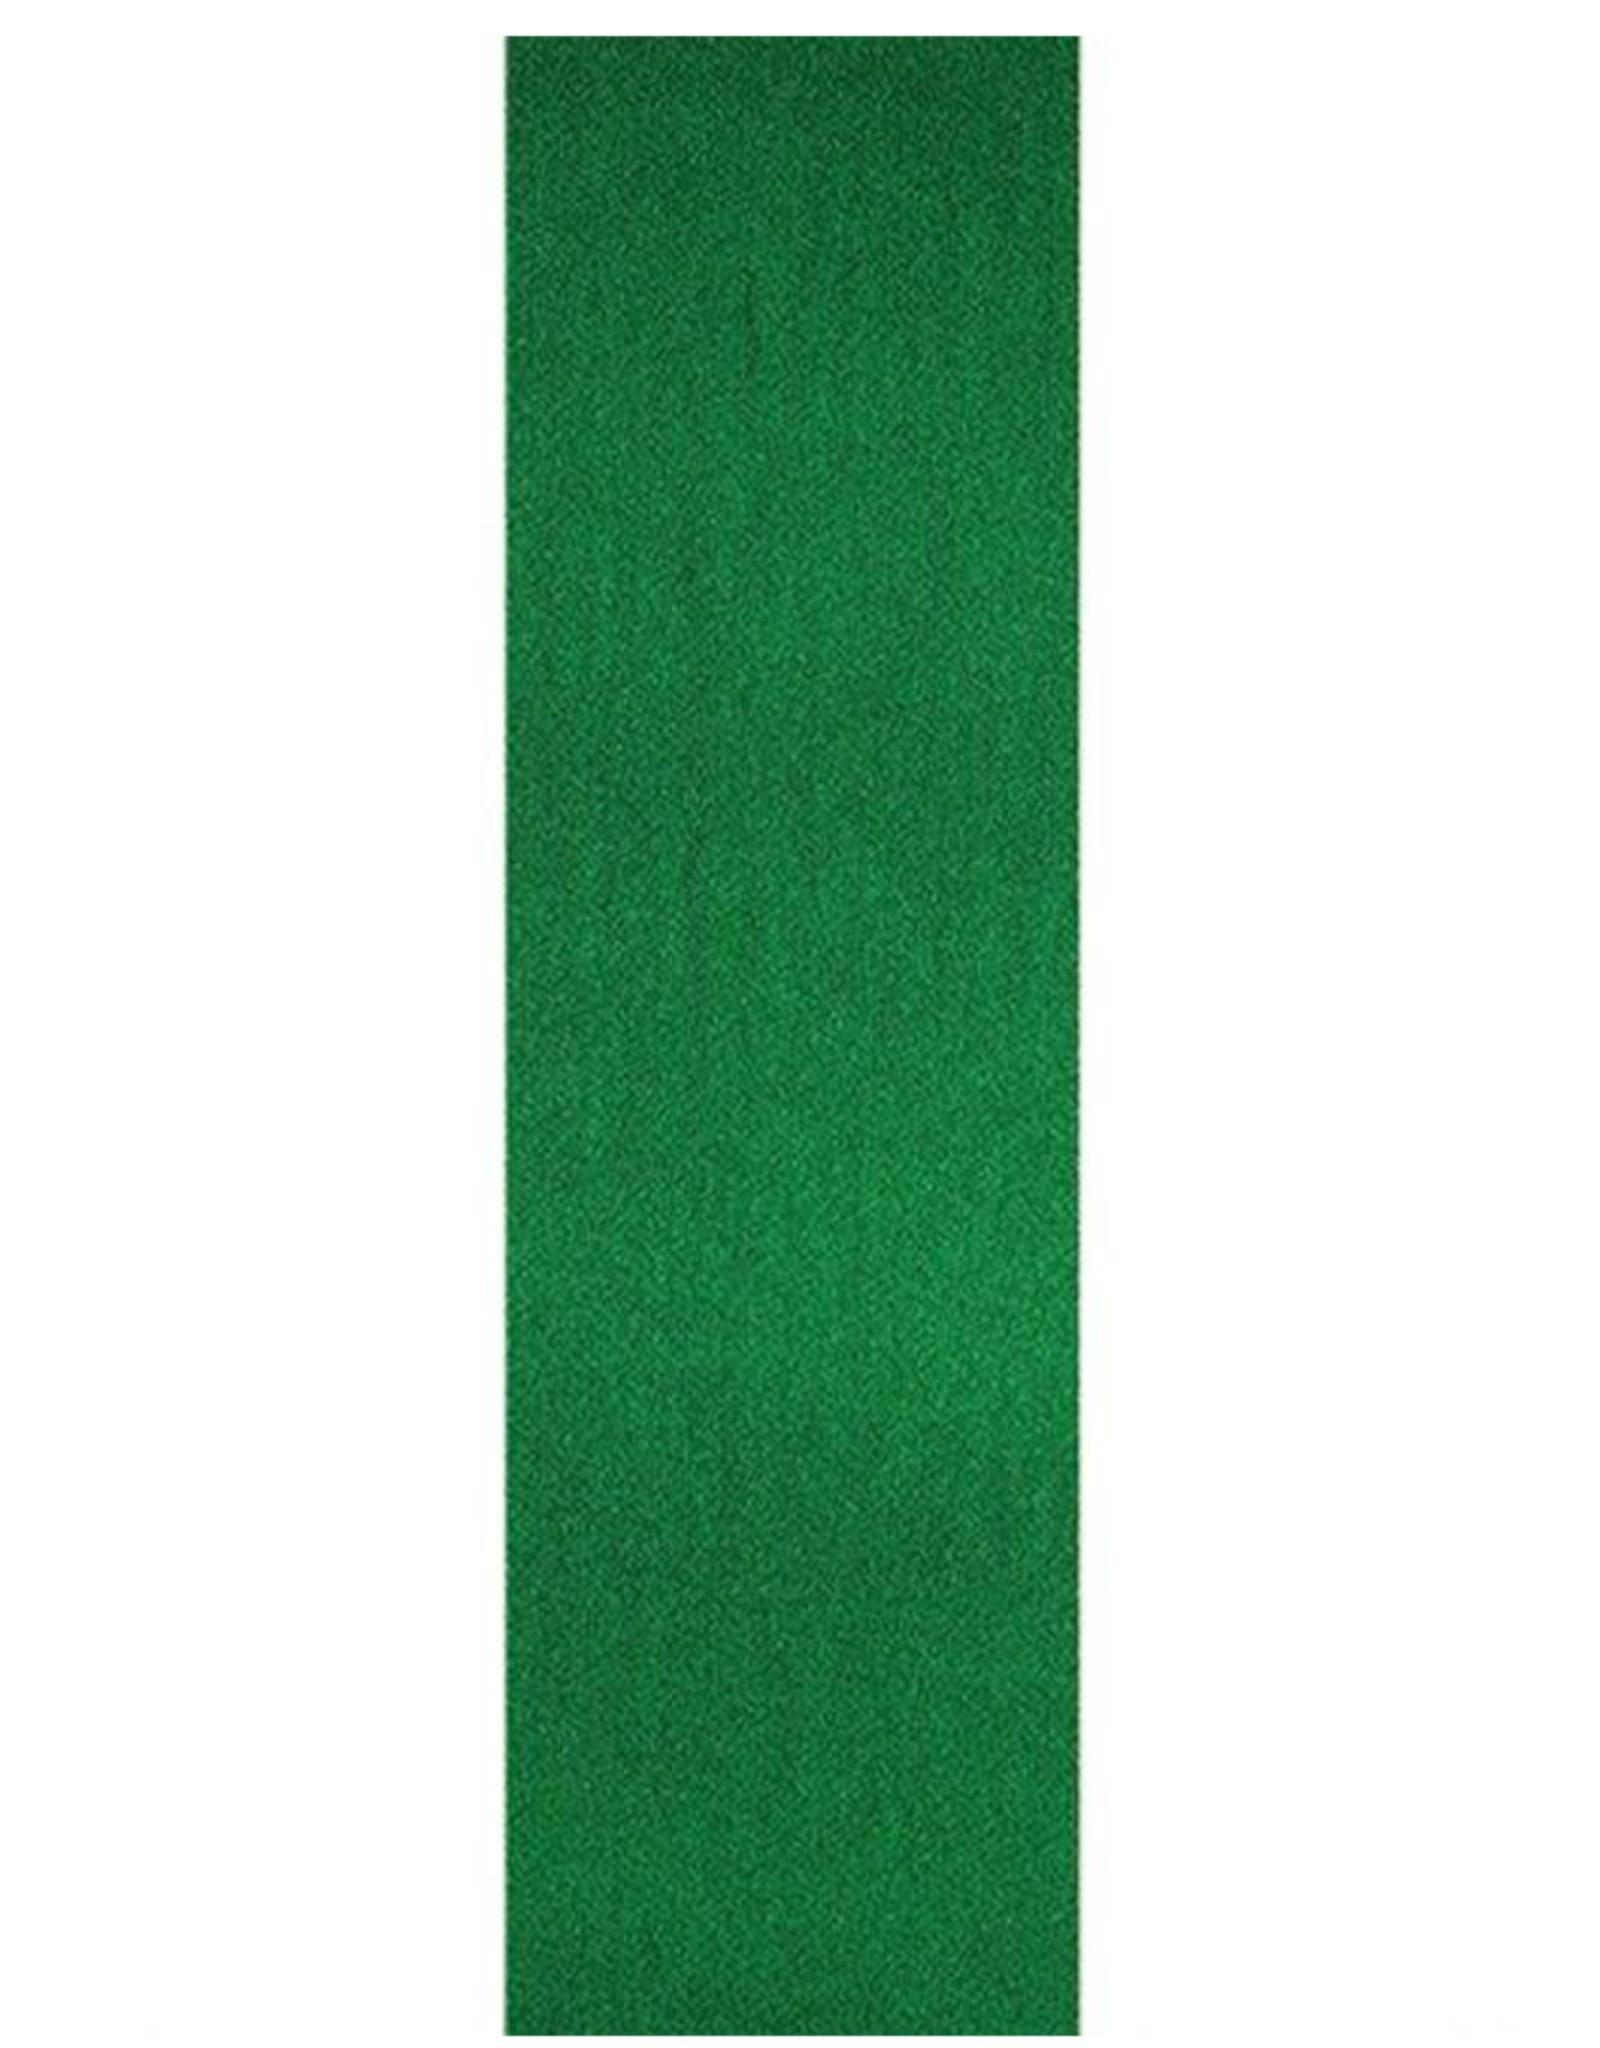 Flik Grip Tape (Green)